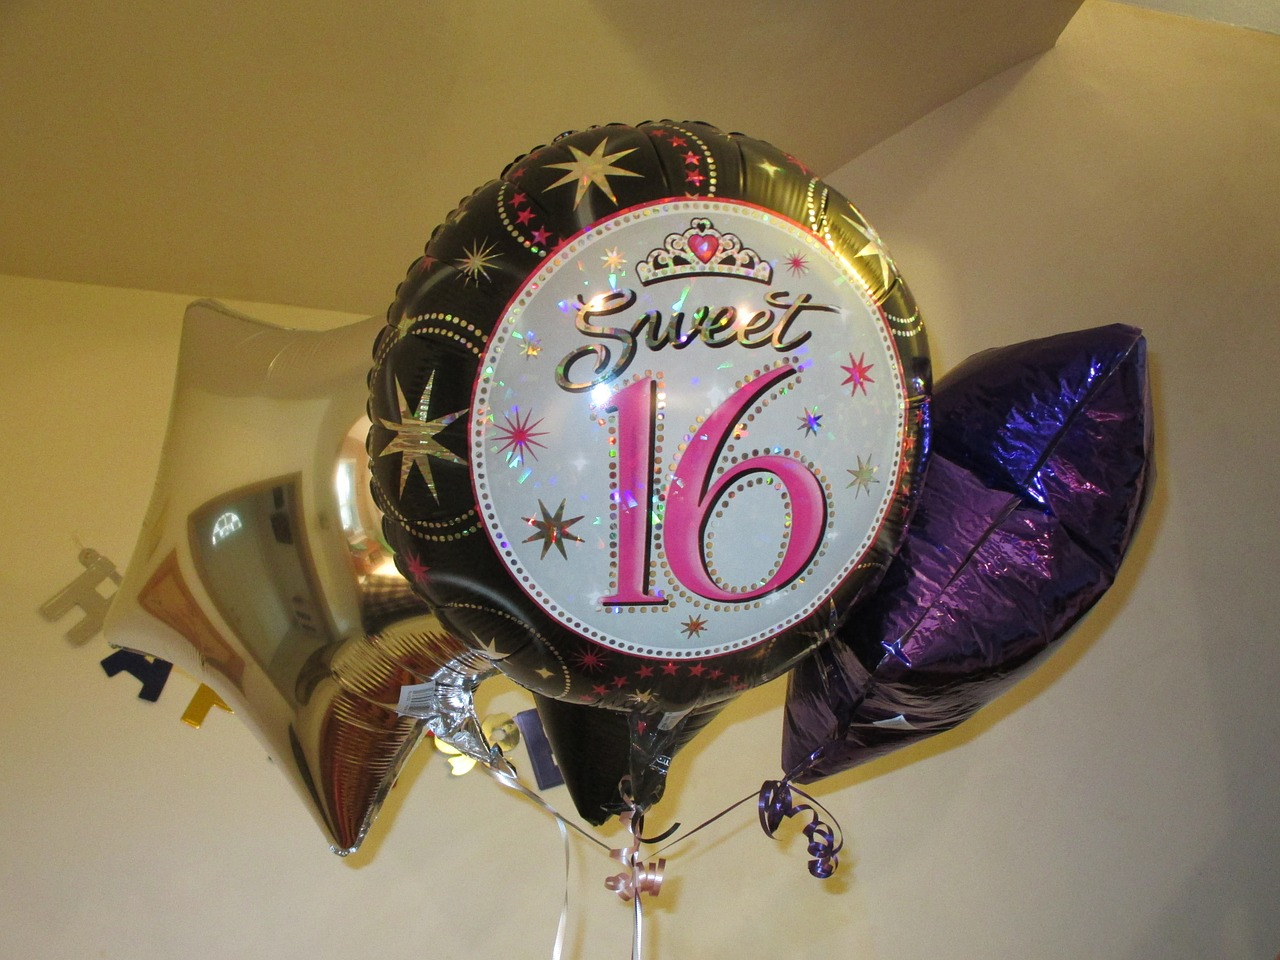 sweet-sixteen-balloons-701710_1280.jpg